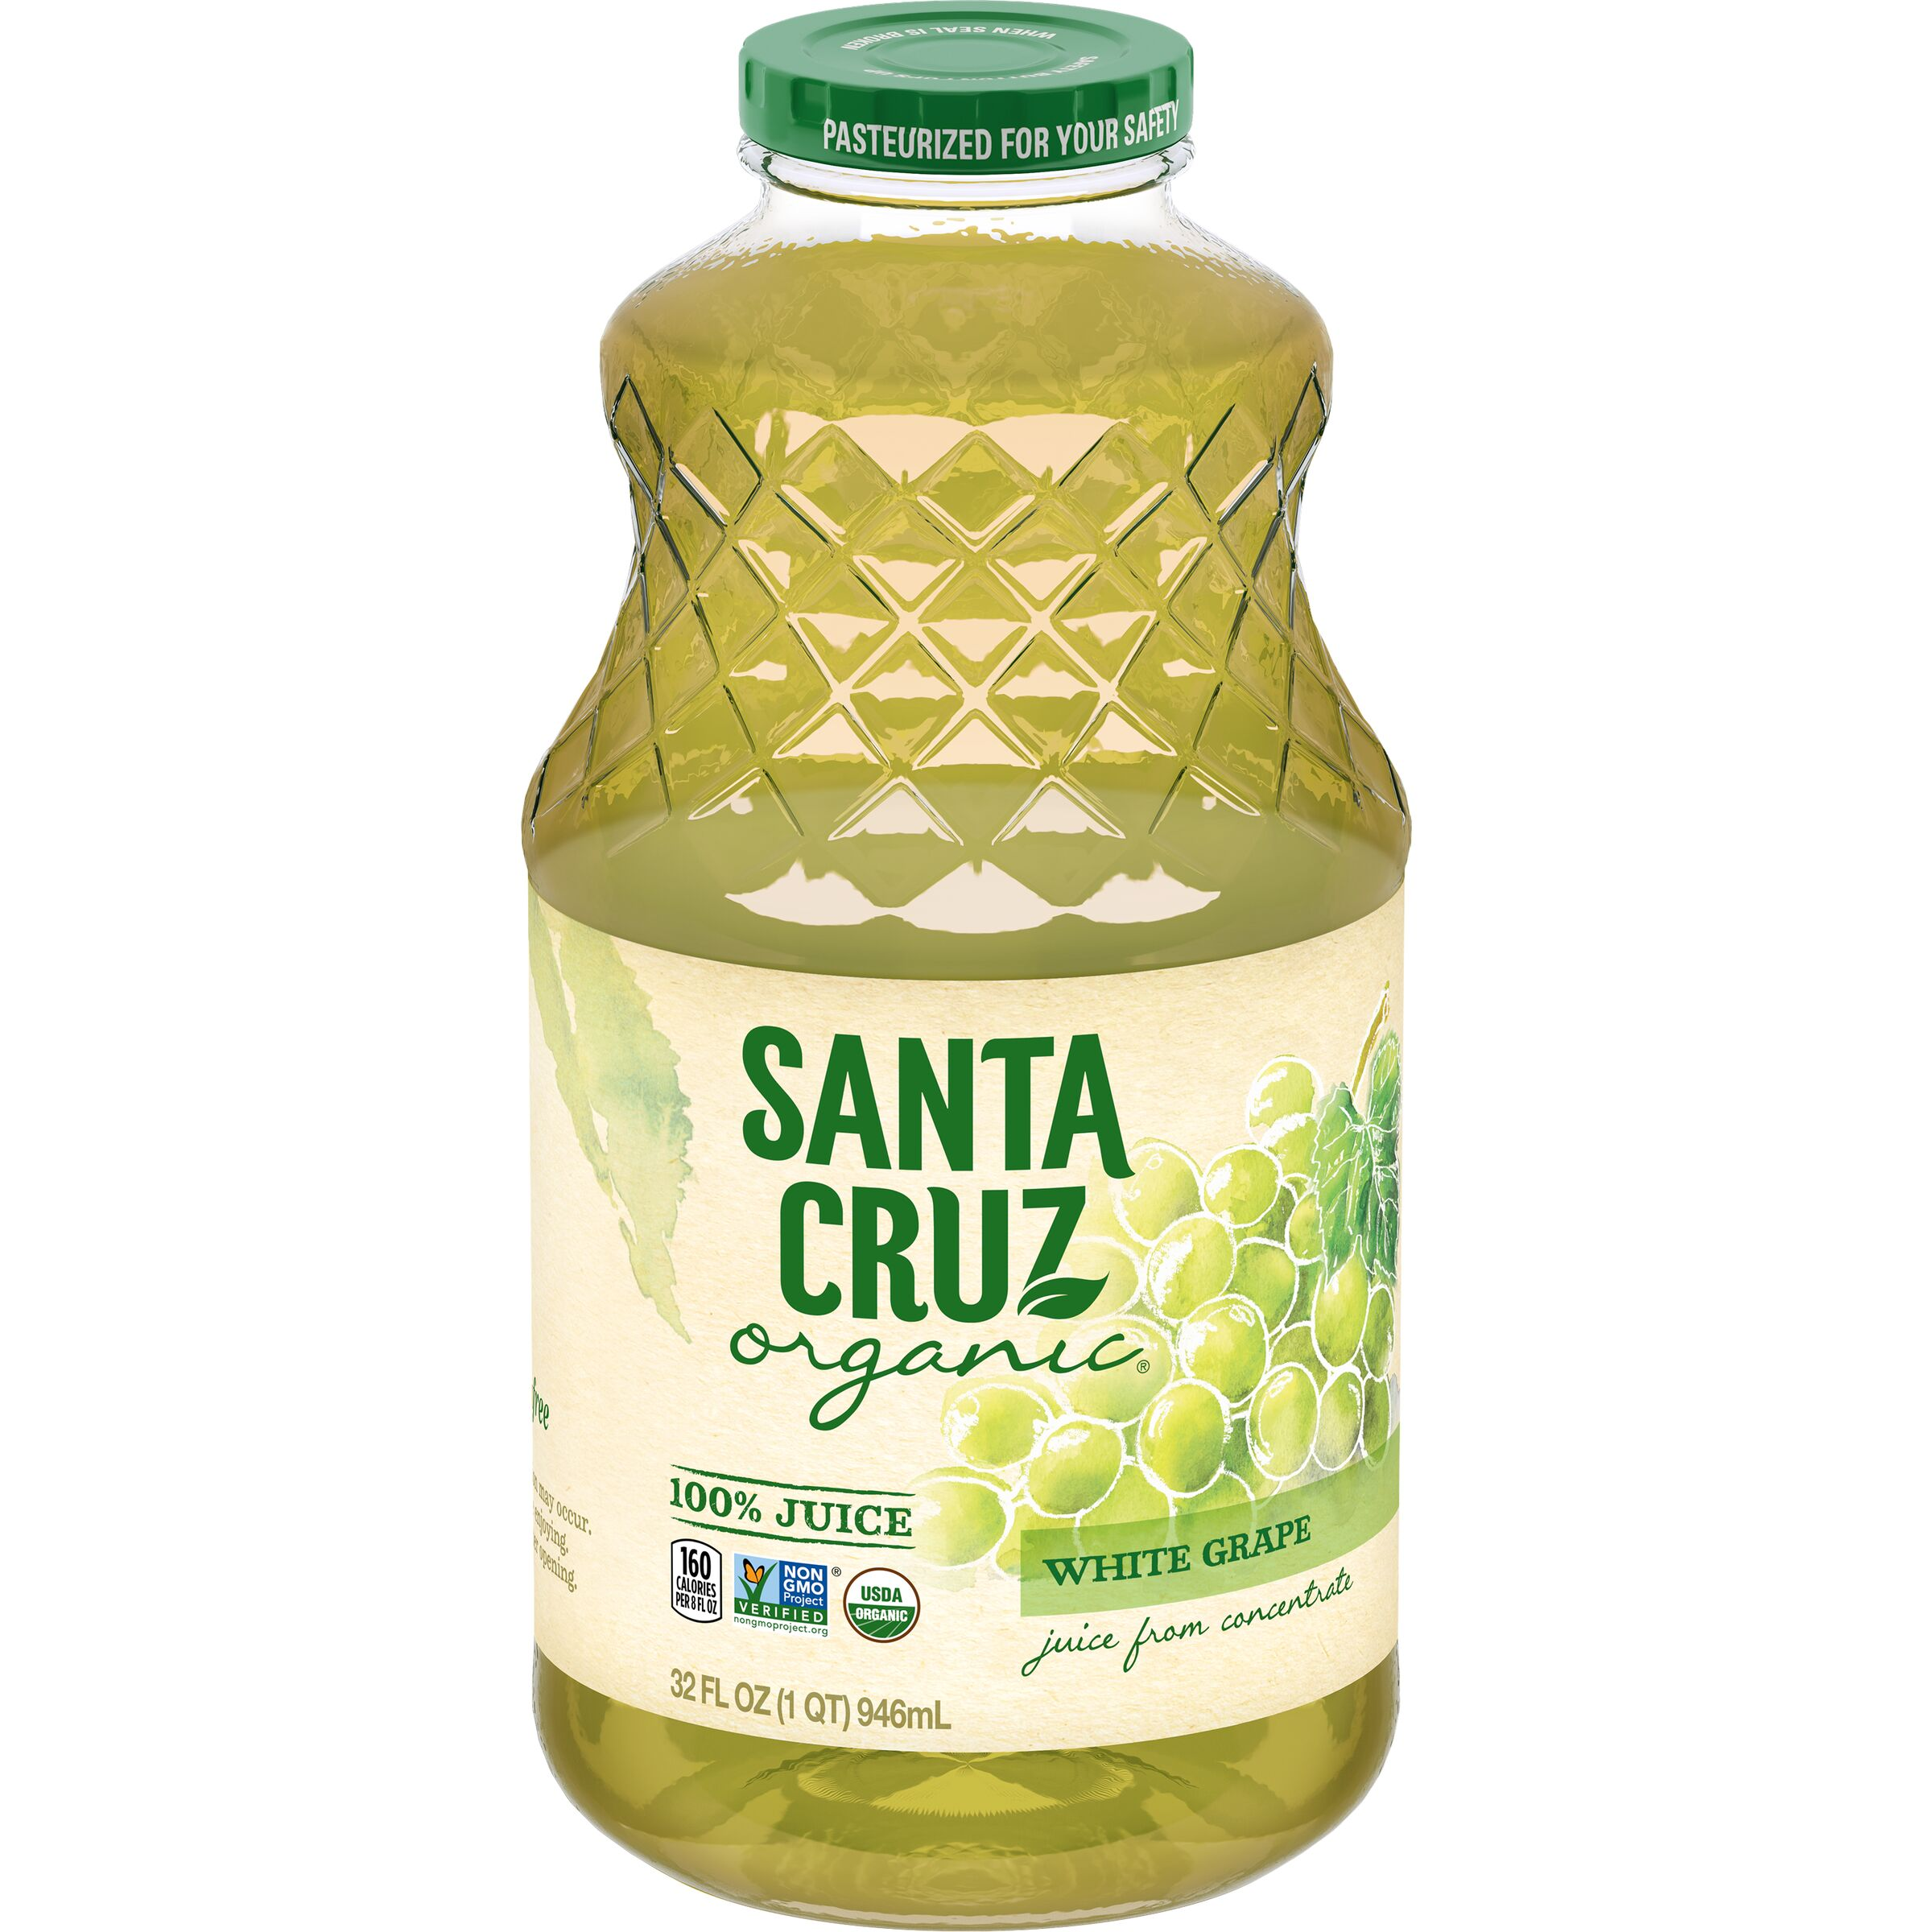 Santa Cruz Organic  White Grape Juice